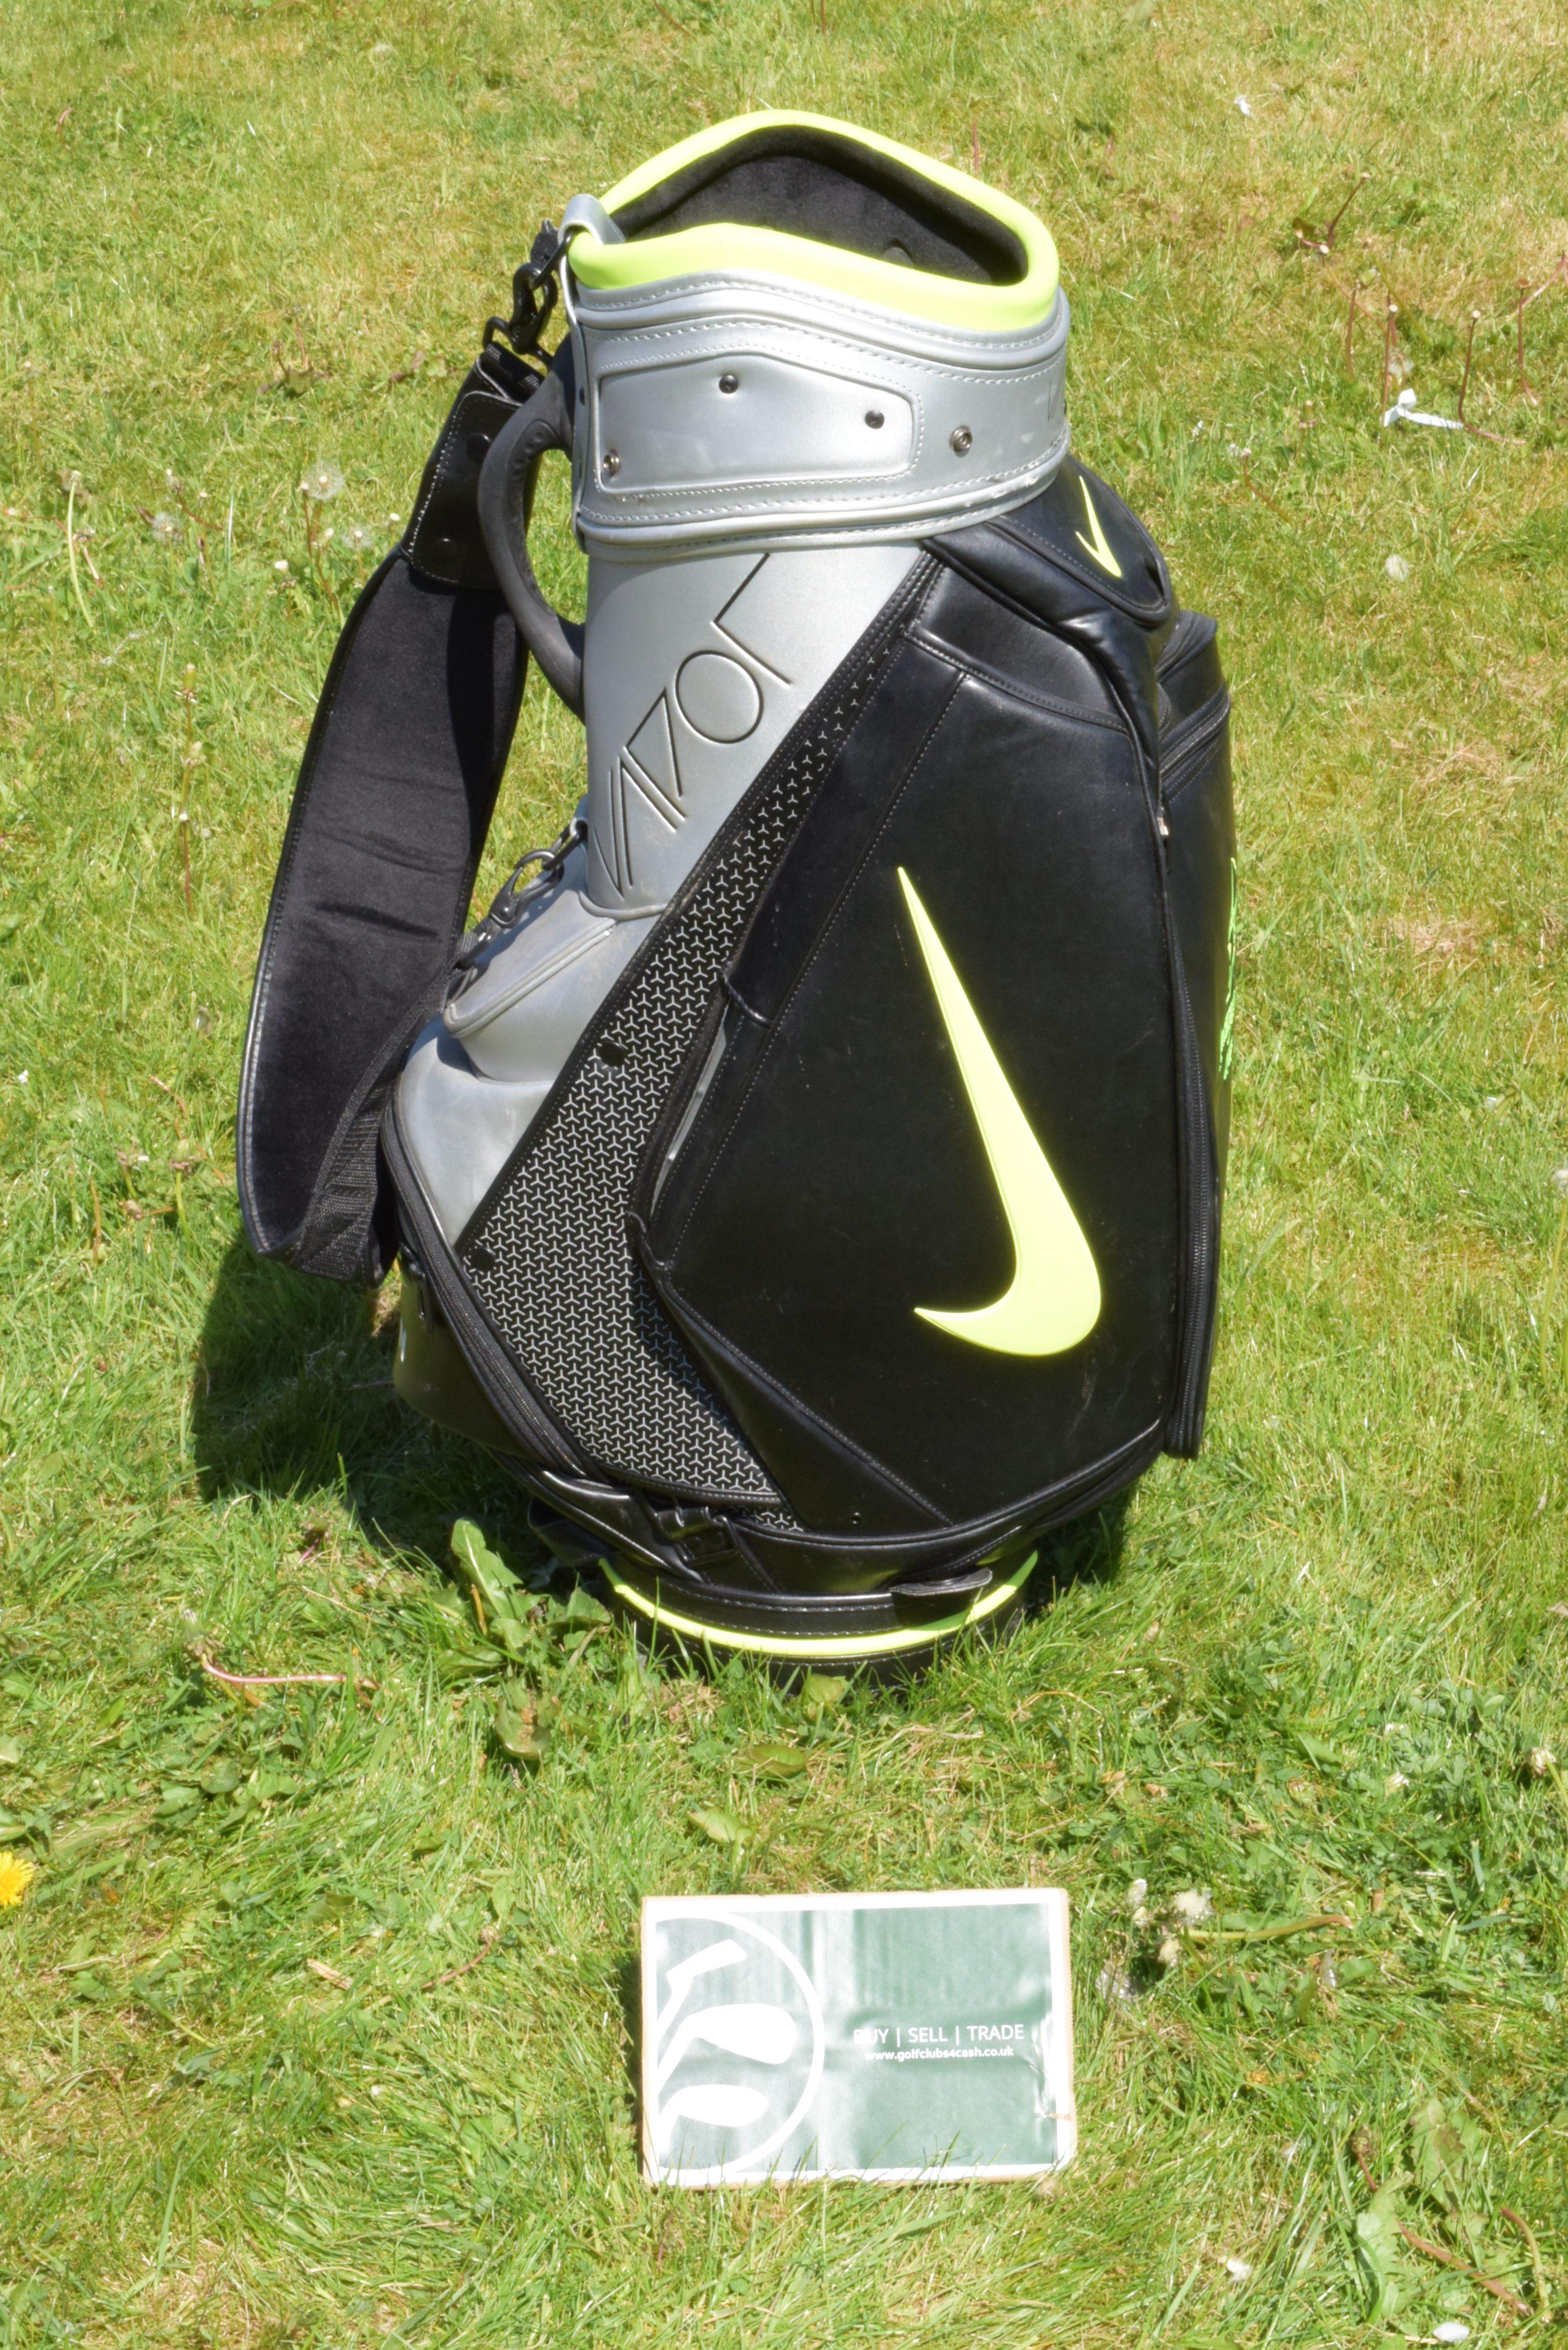 Nike Vapor Tour Cart Bag Lime Black Silver 6 Way Nigvap010